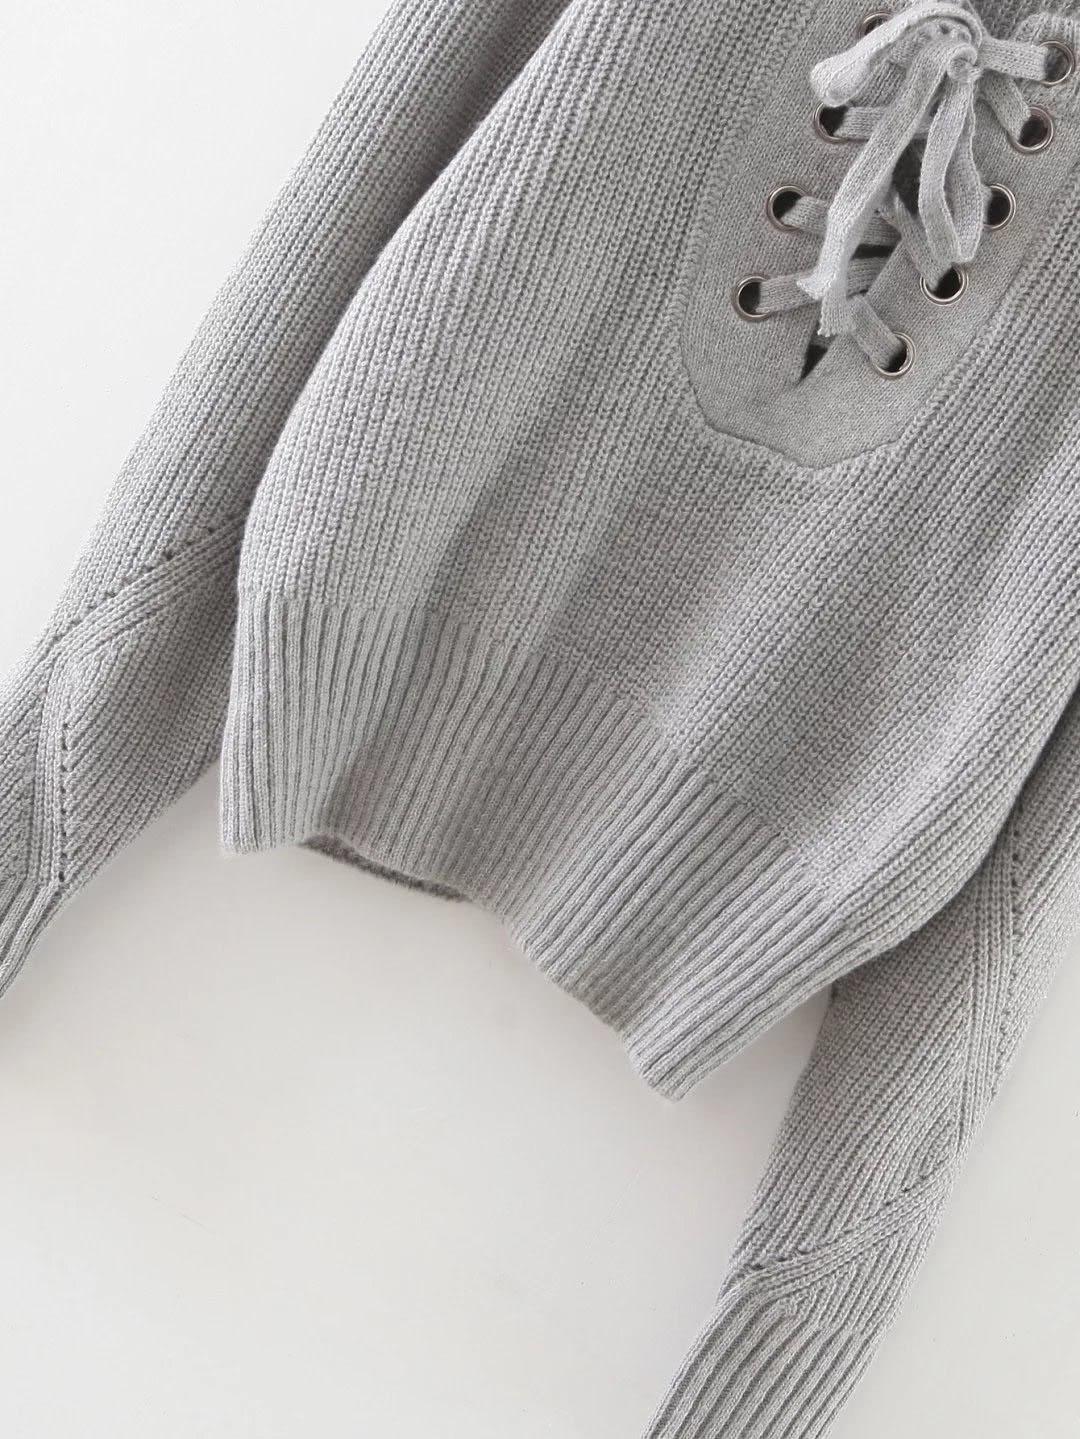 sweater160920222_2